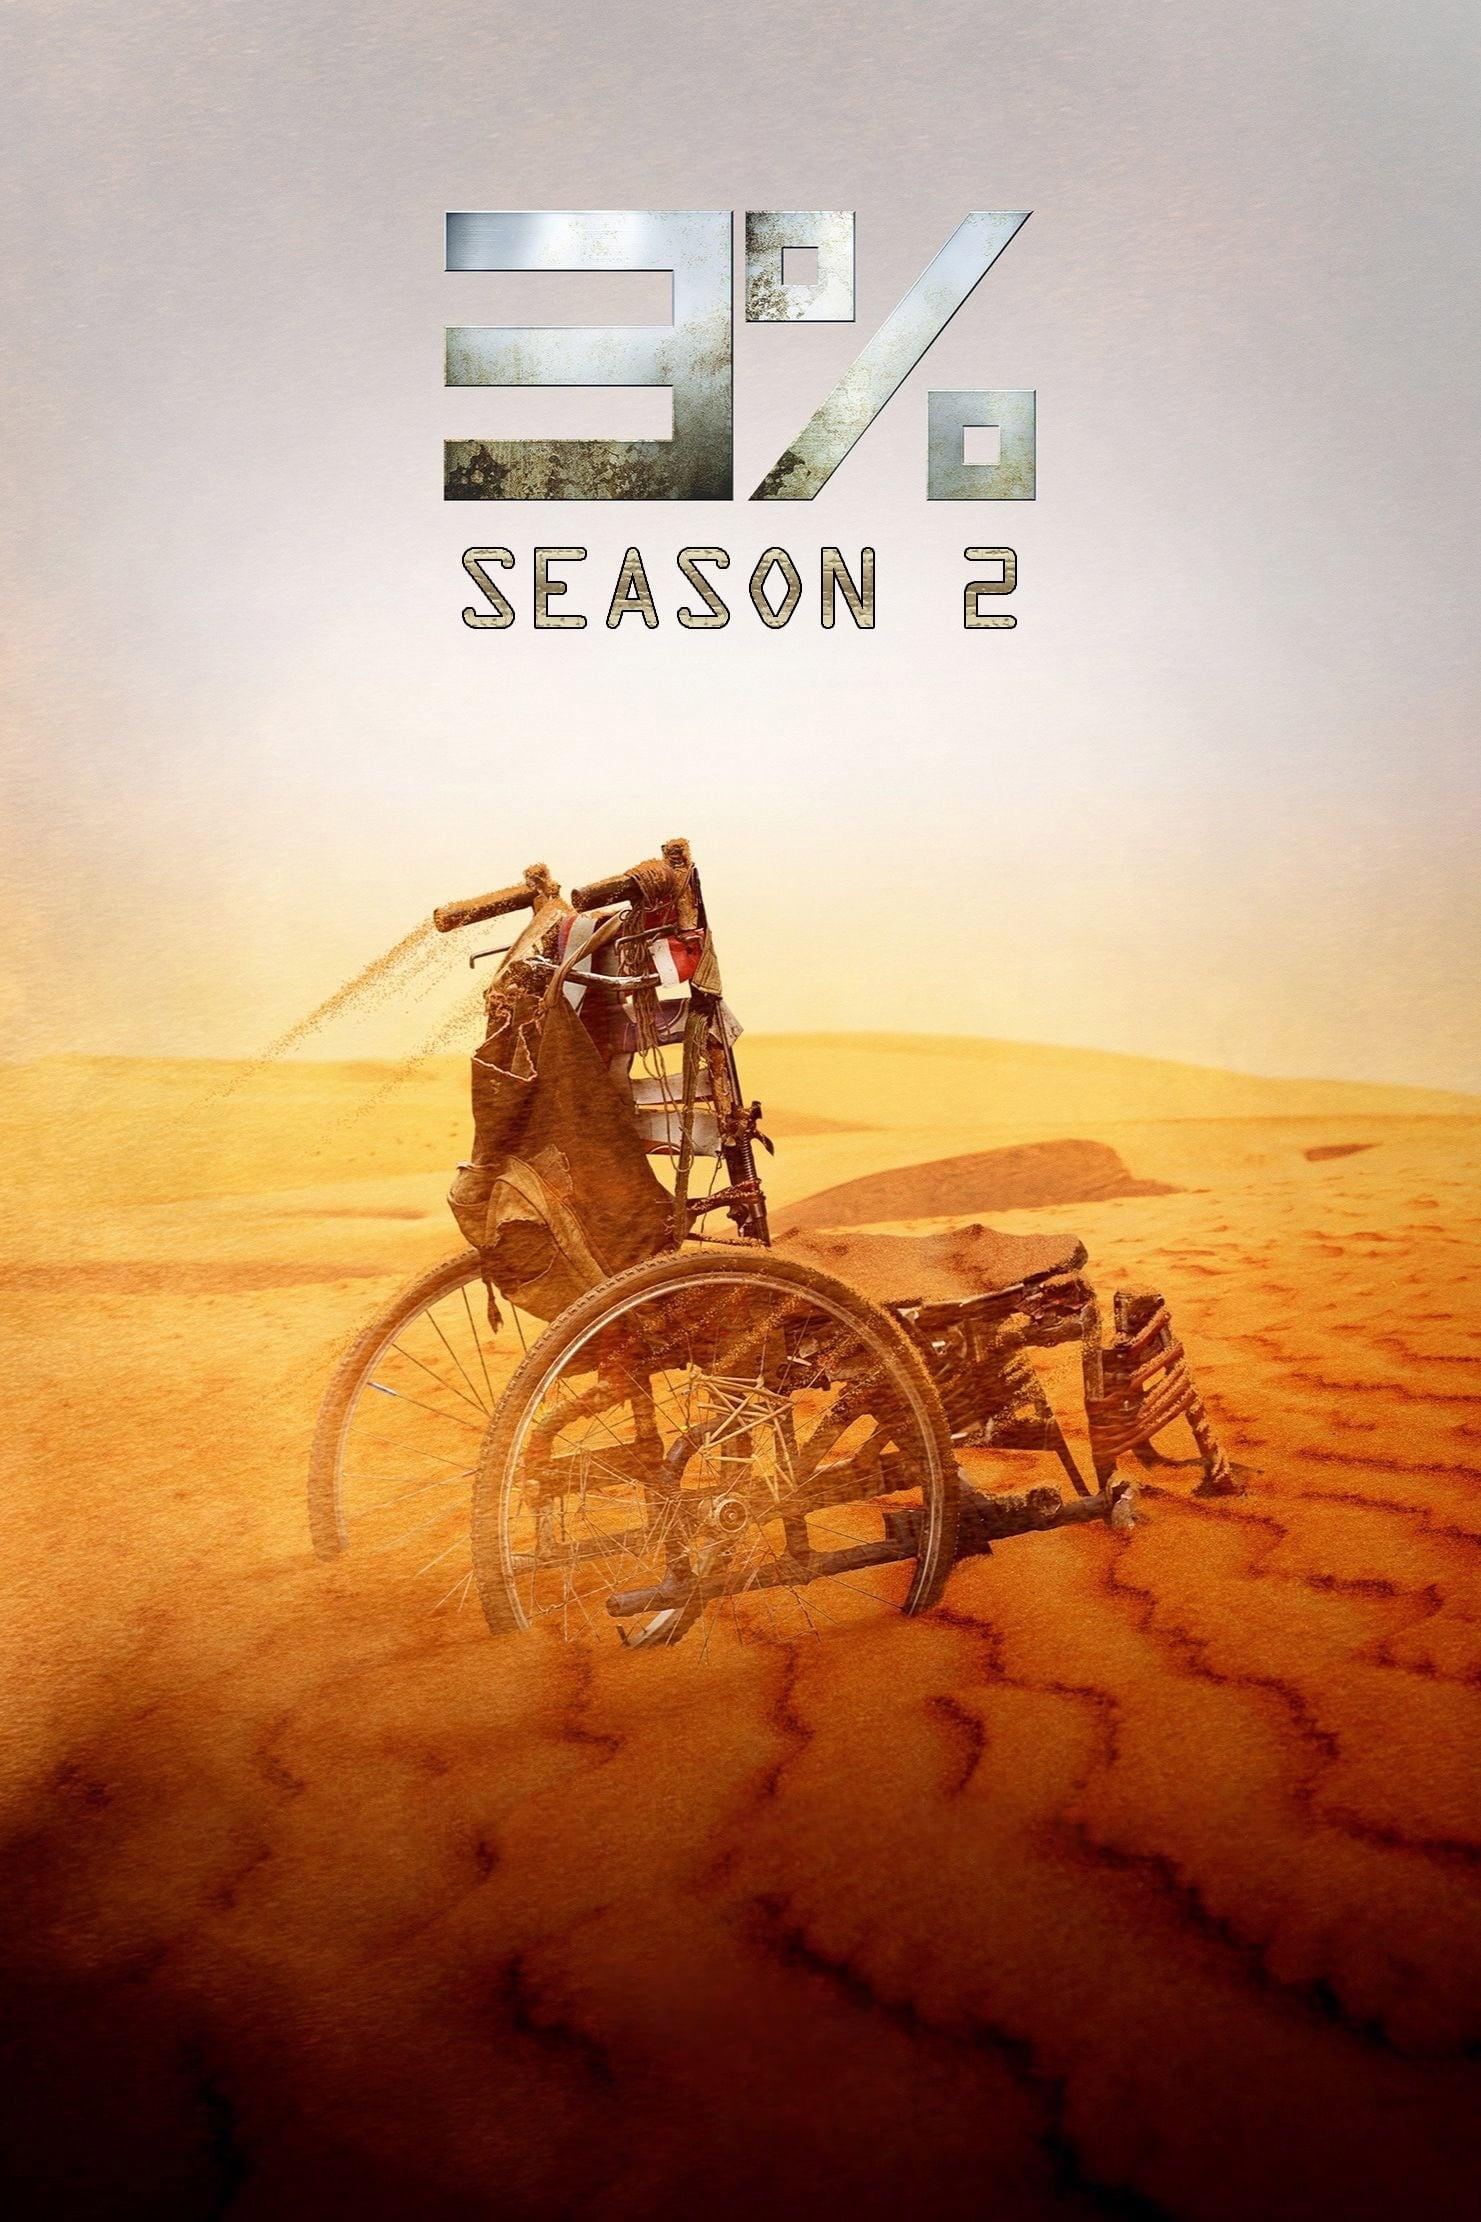 3% Season 2